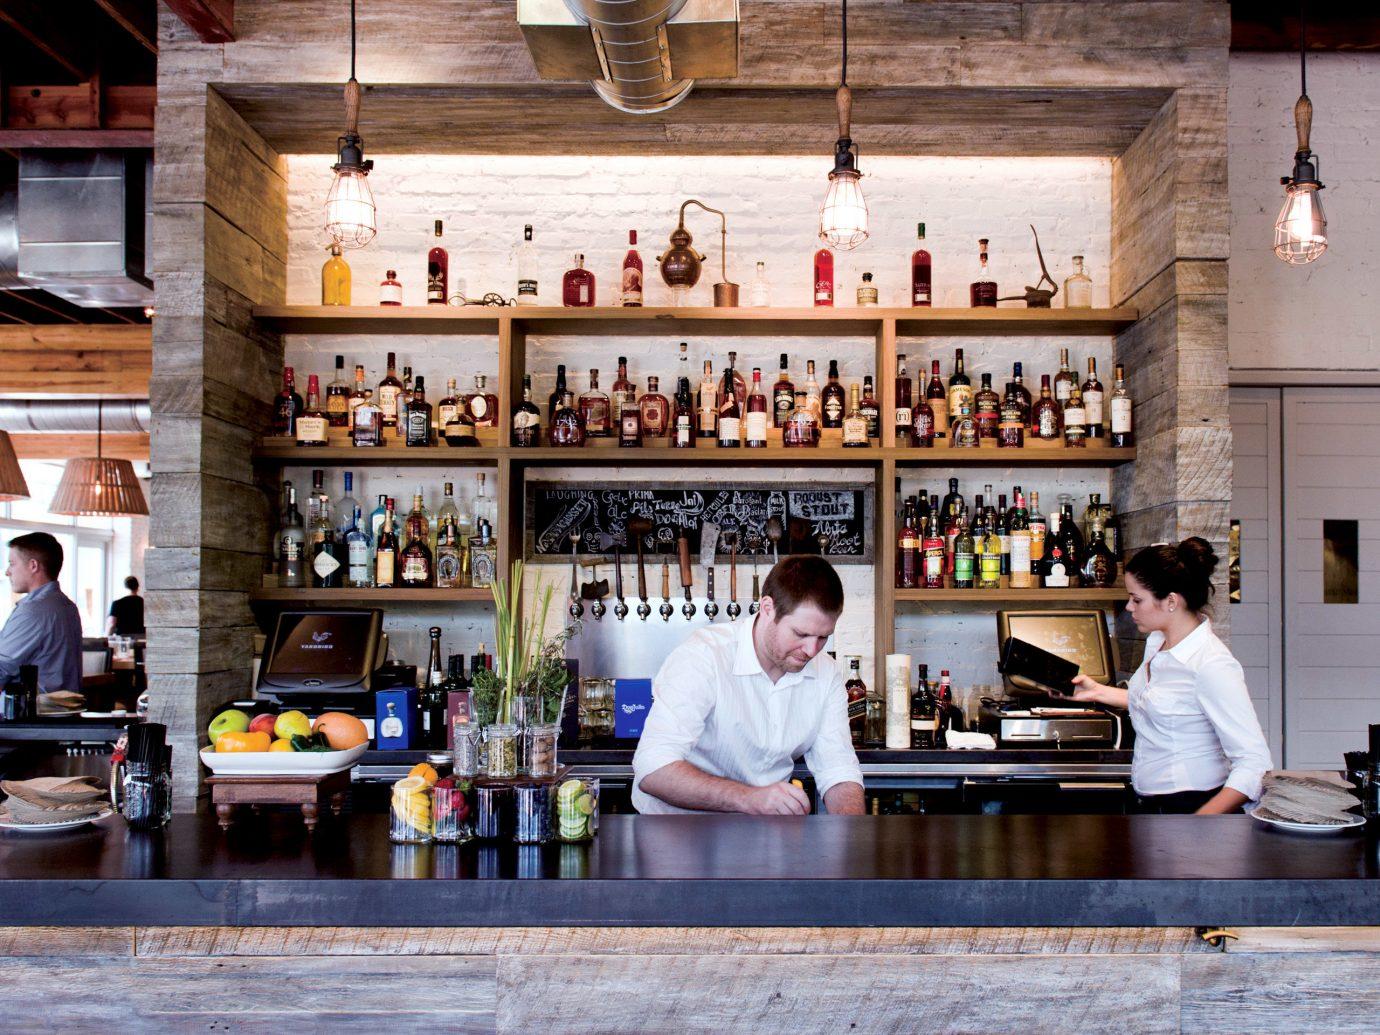 Travel Tips indoor counter restaurant Bar café interior design Drink coffeehouse cooking